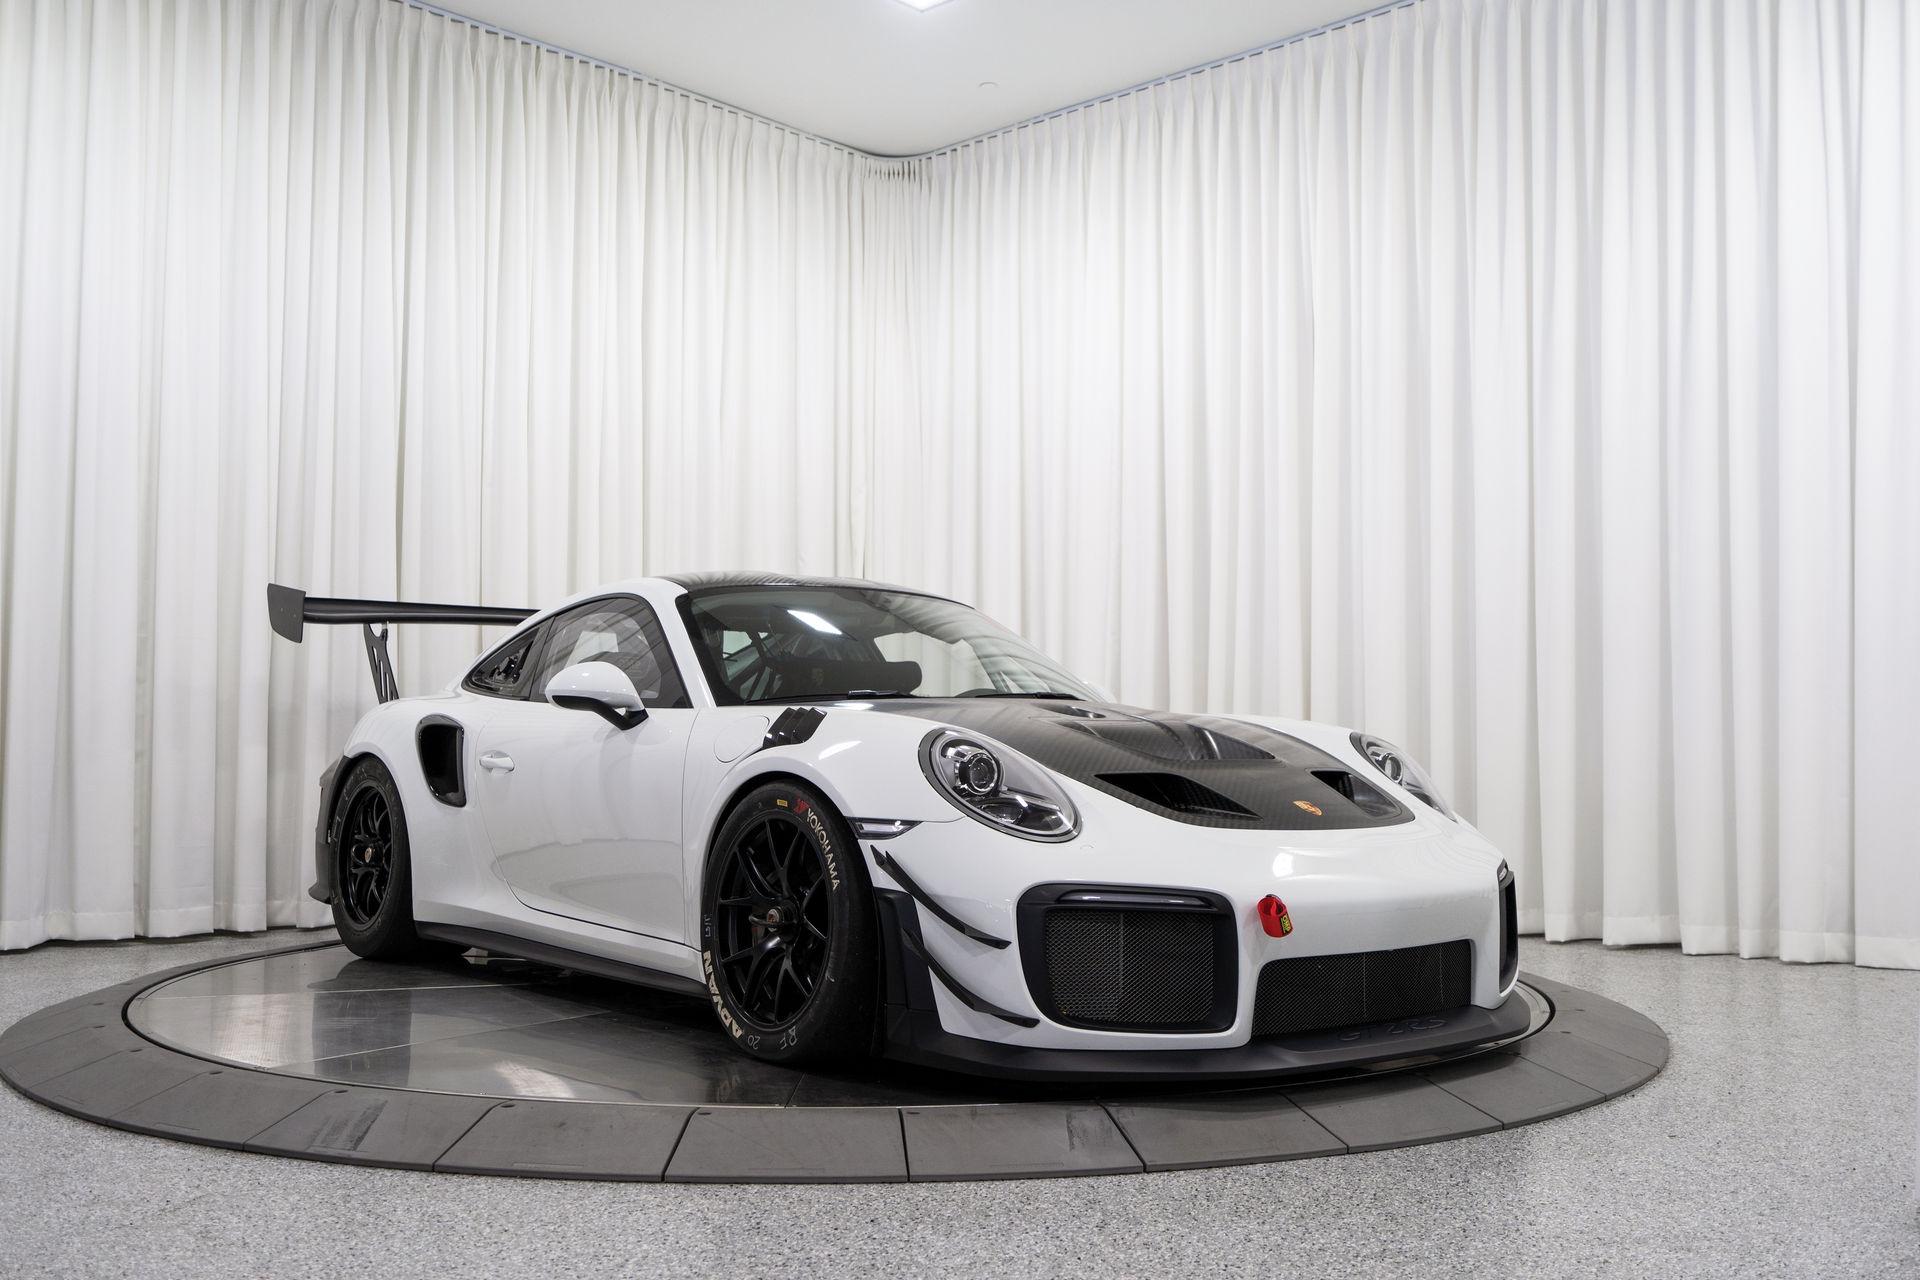 Porsche-911-GT2-RS-Clubsport-auction-4